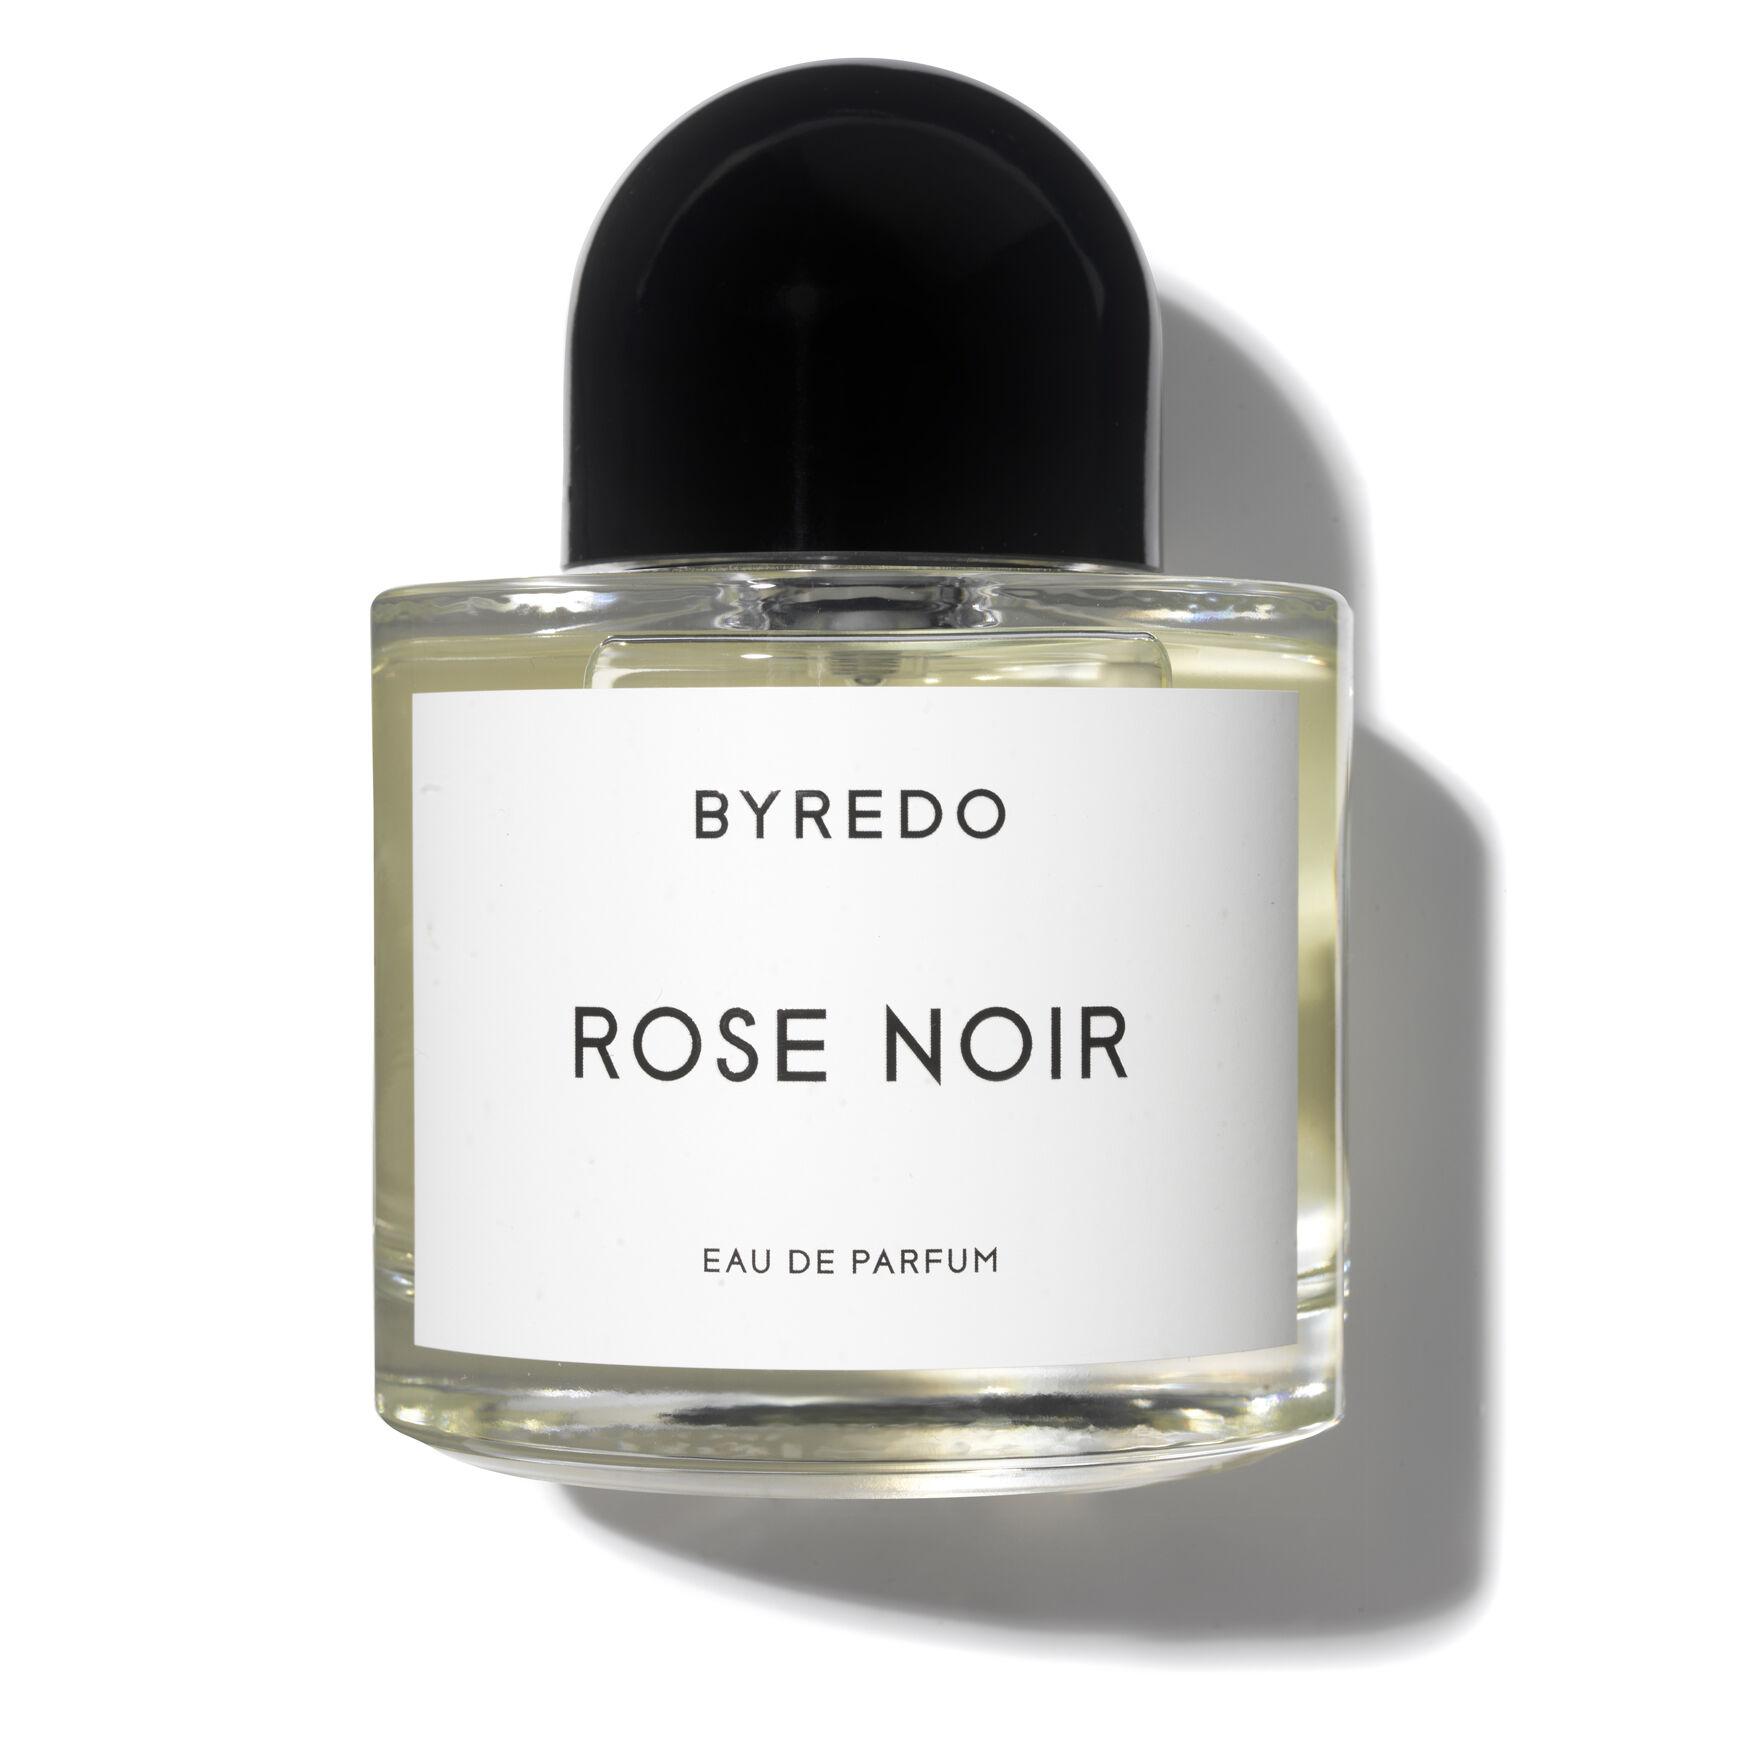 Nước hoa Rose Noir của Byredo